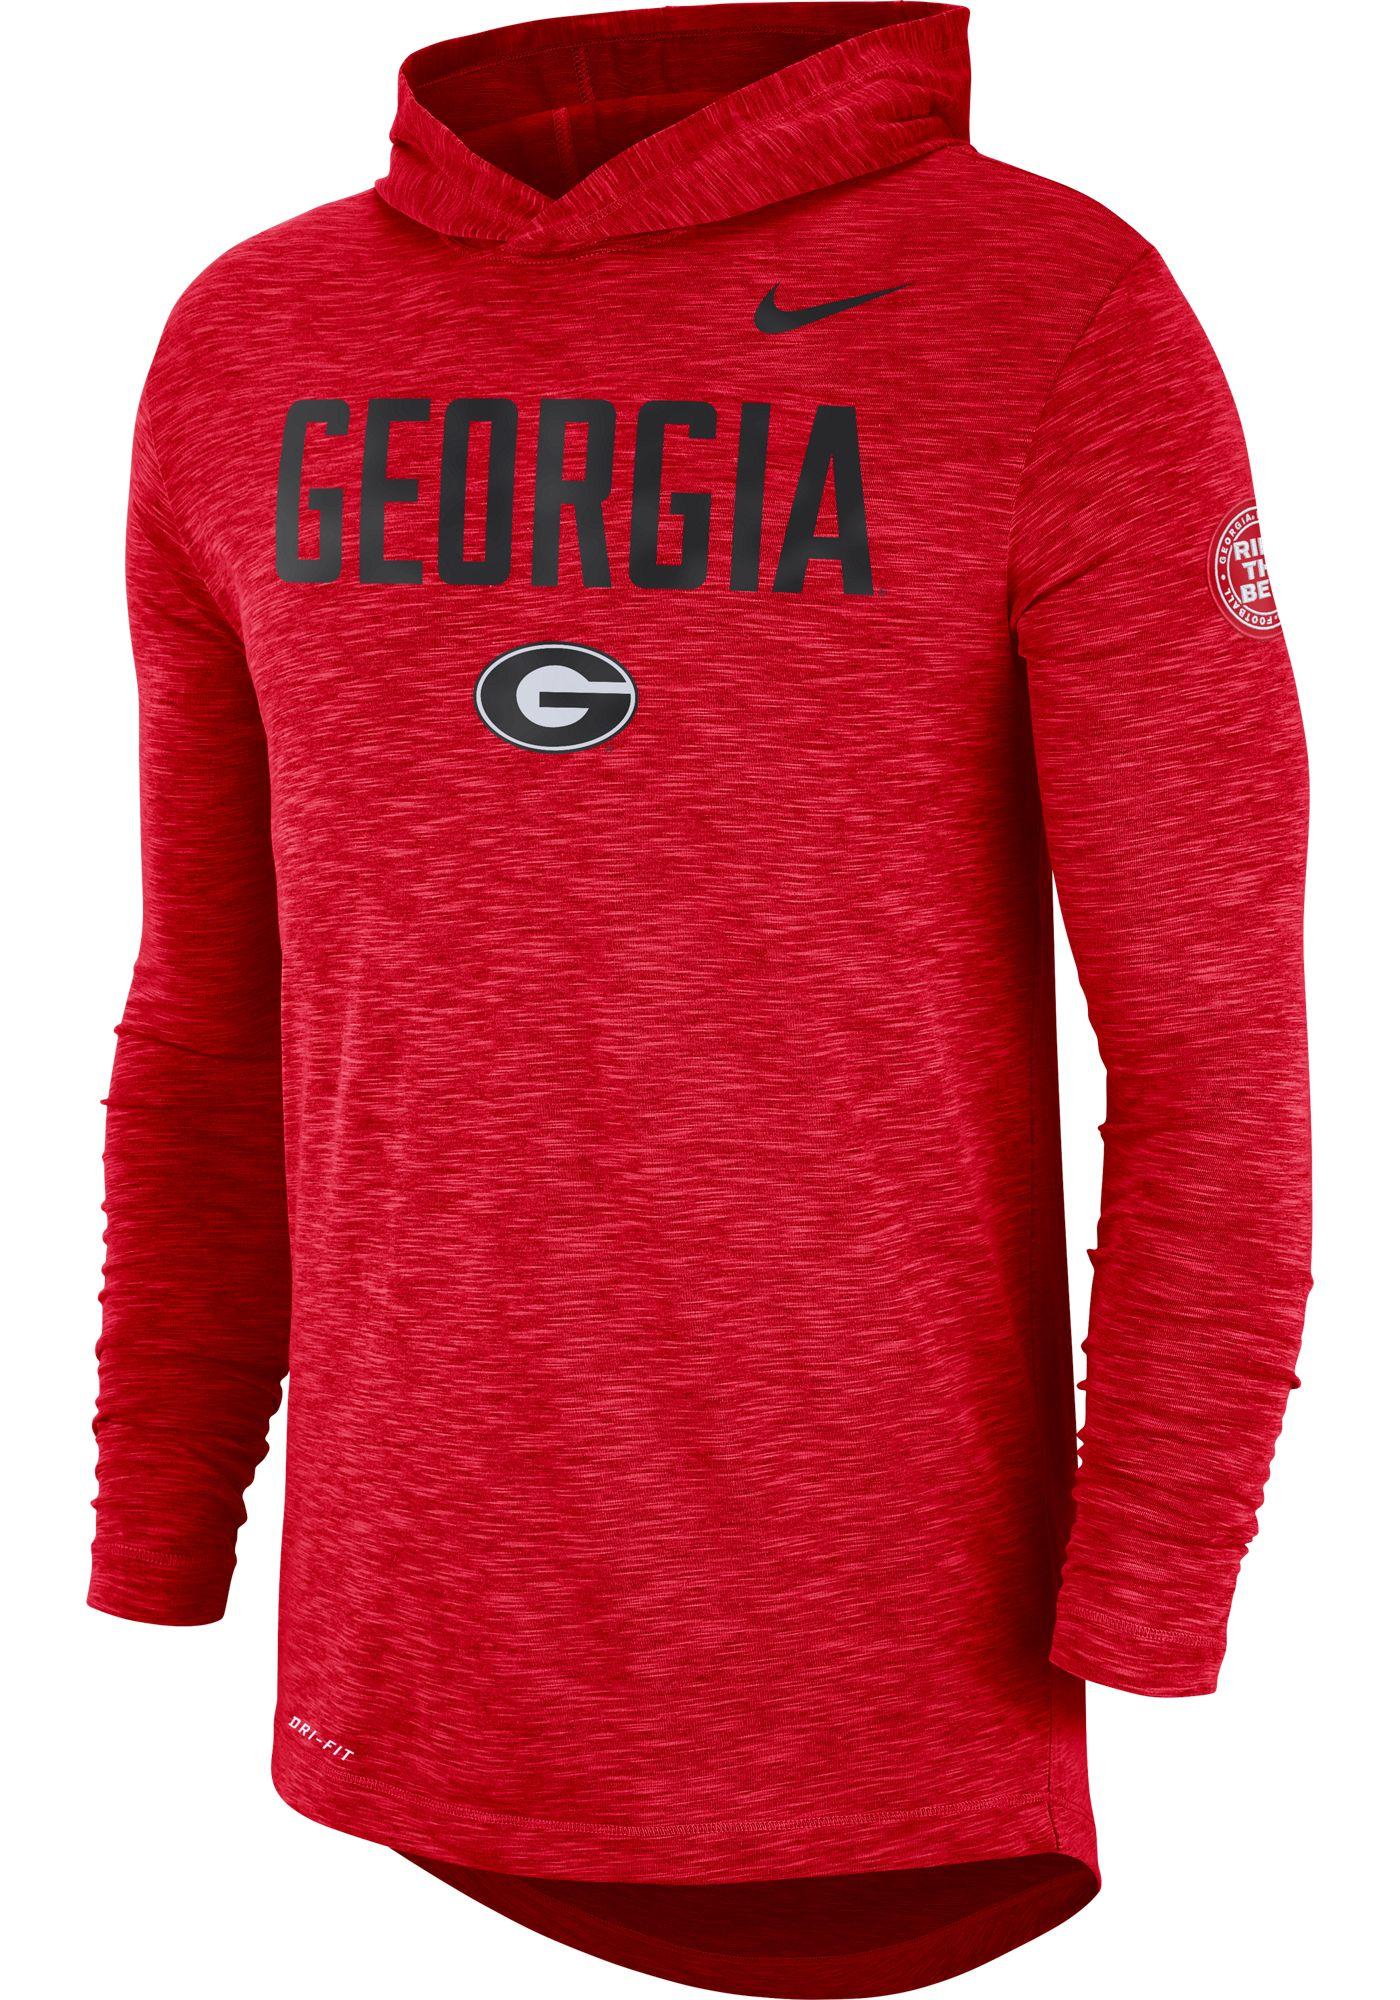 Nike Men's Georgia Bulldogs Red Dri-FIT Rivalry Football Sideline Hooded T-Shirt